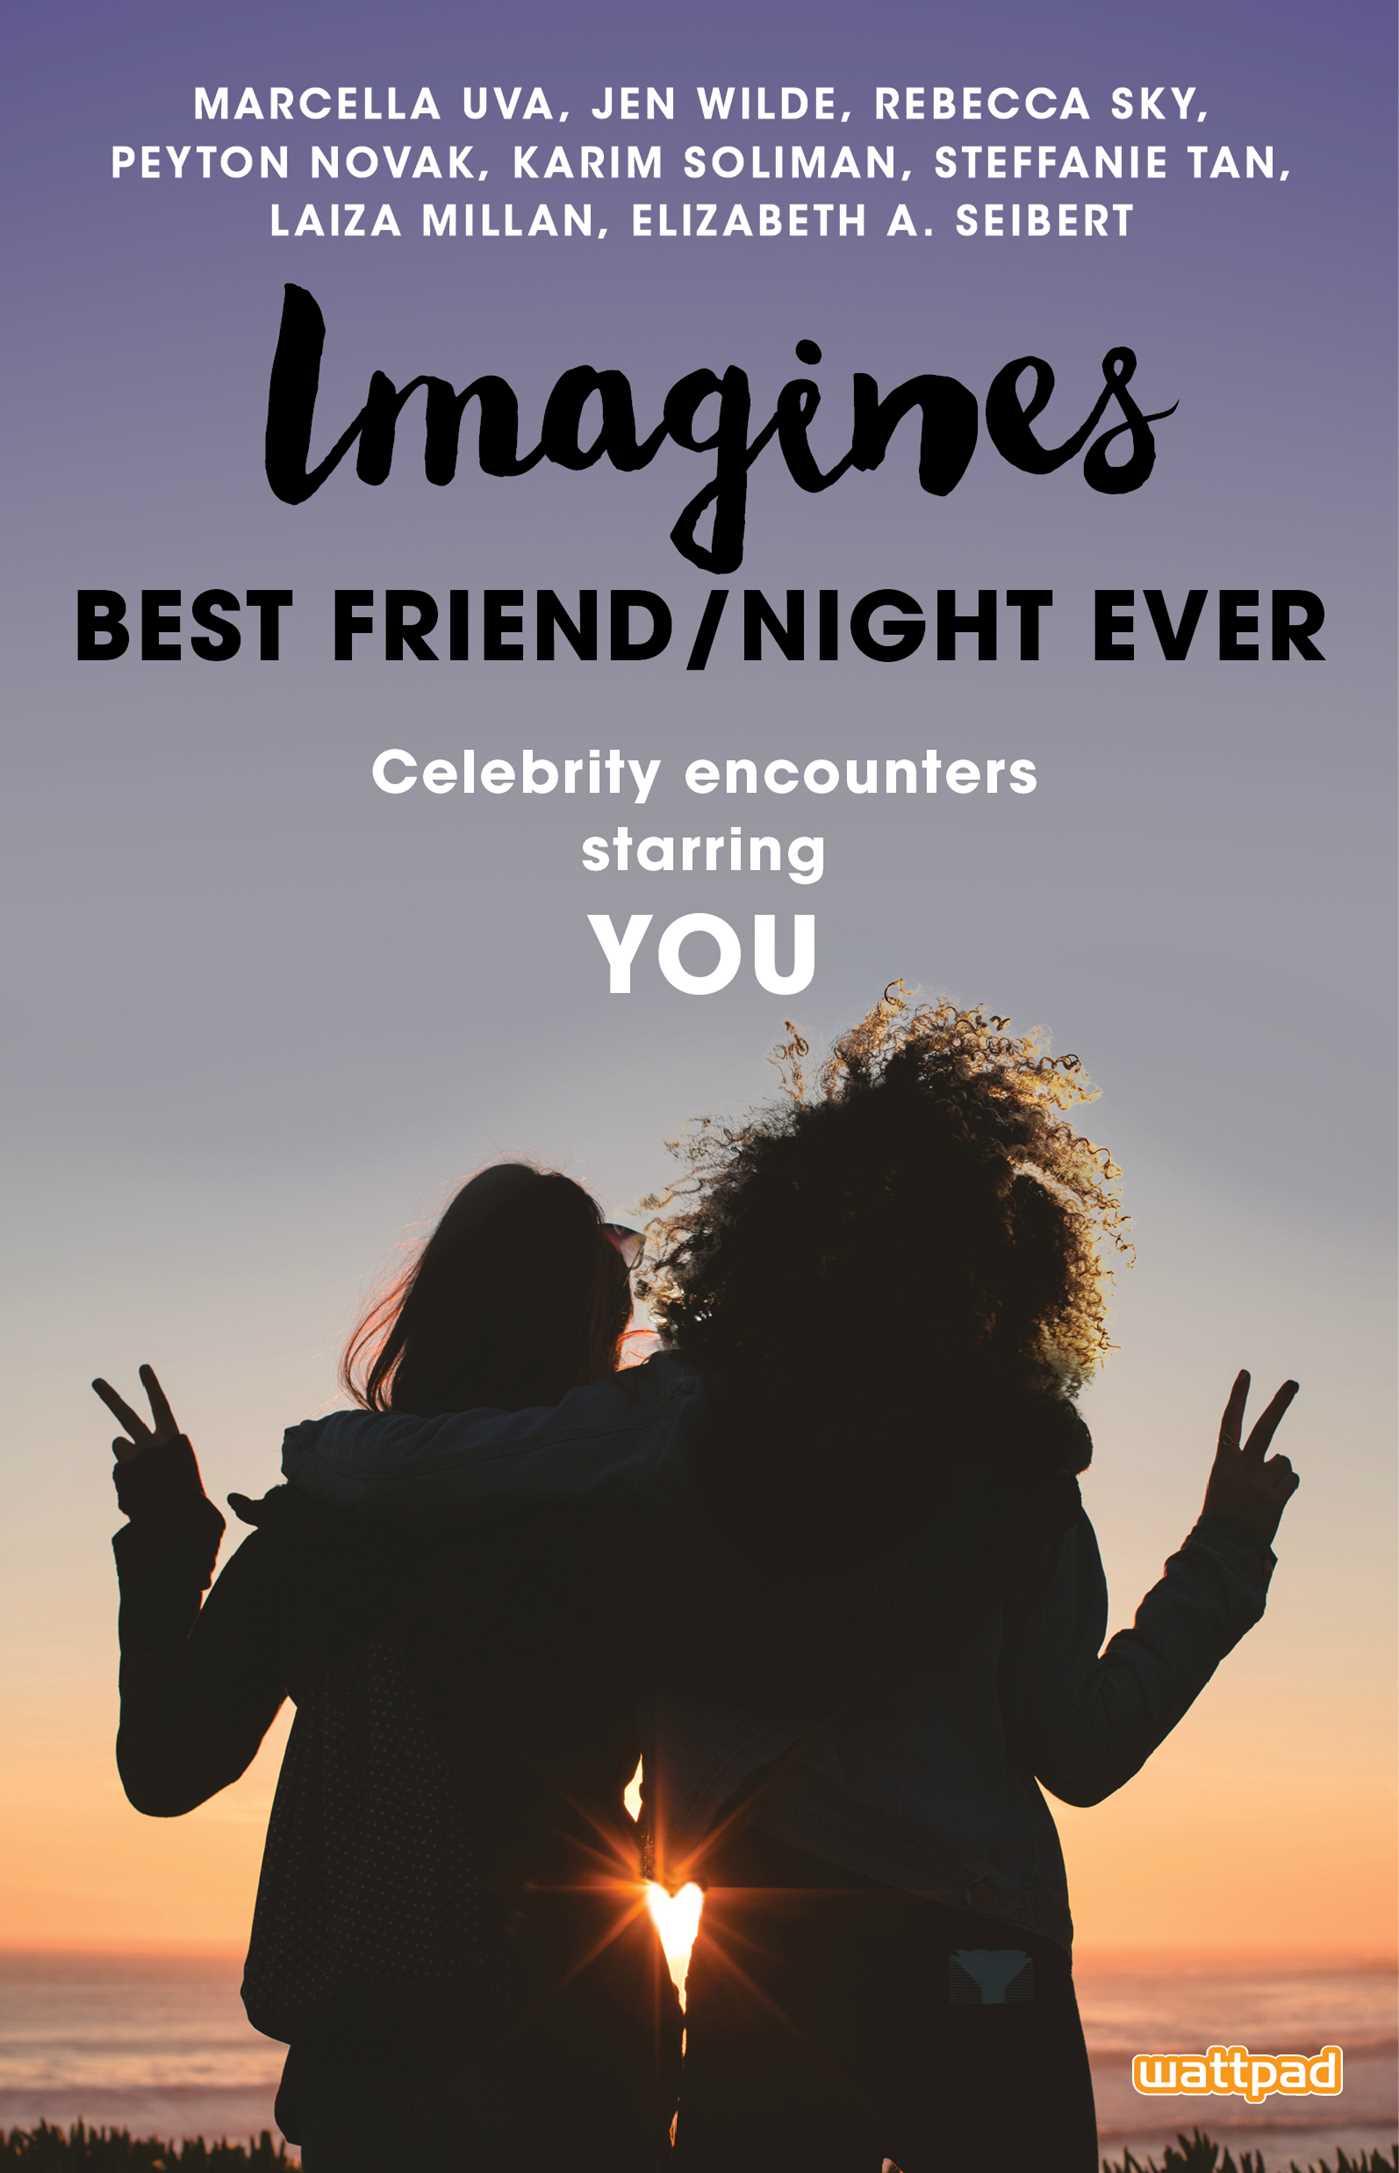 Imagines best friend night ever 9781501158674 hr